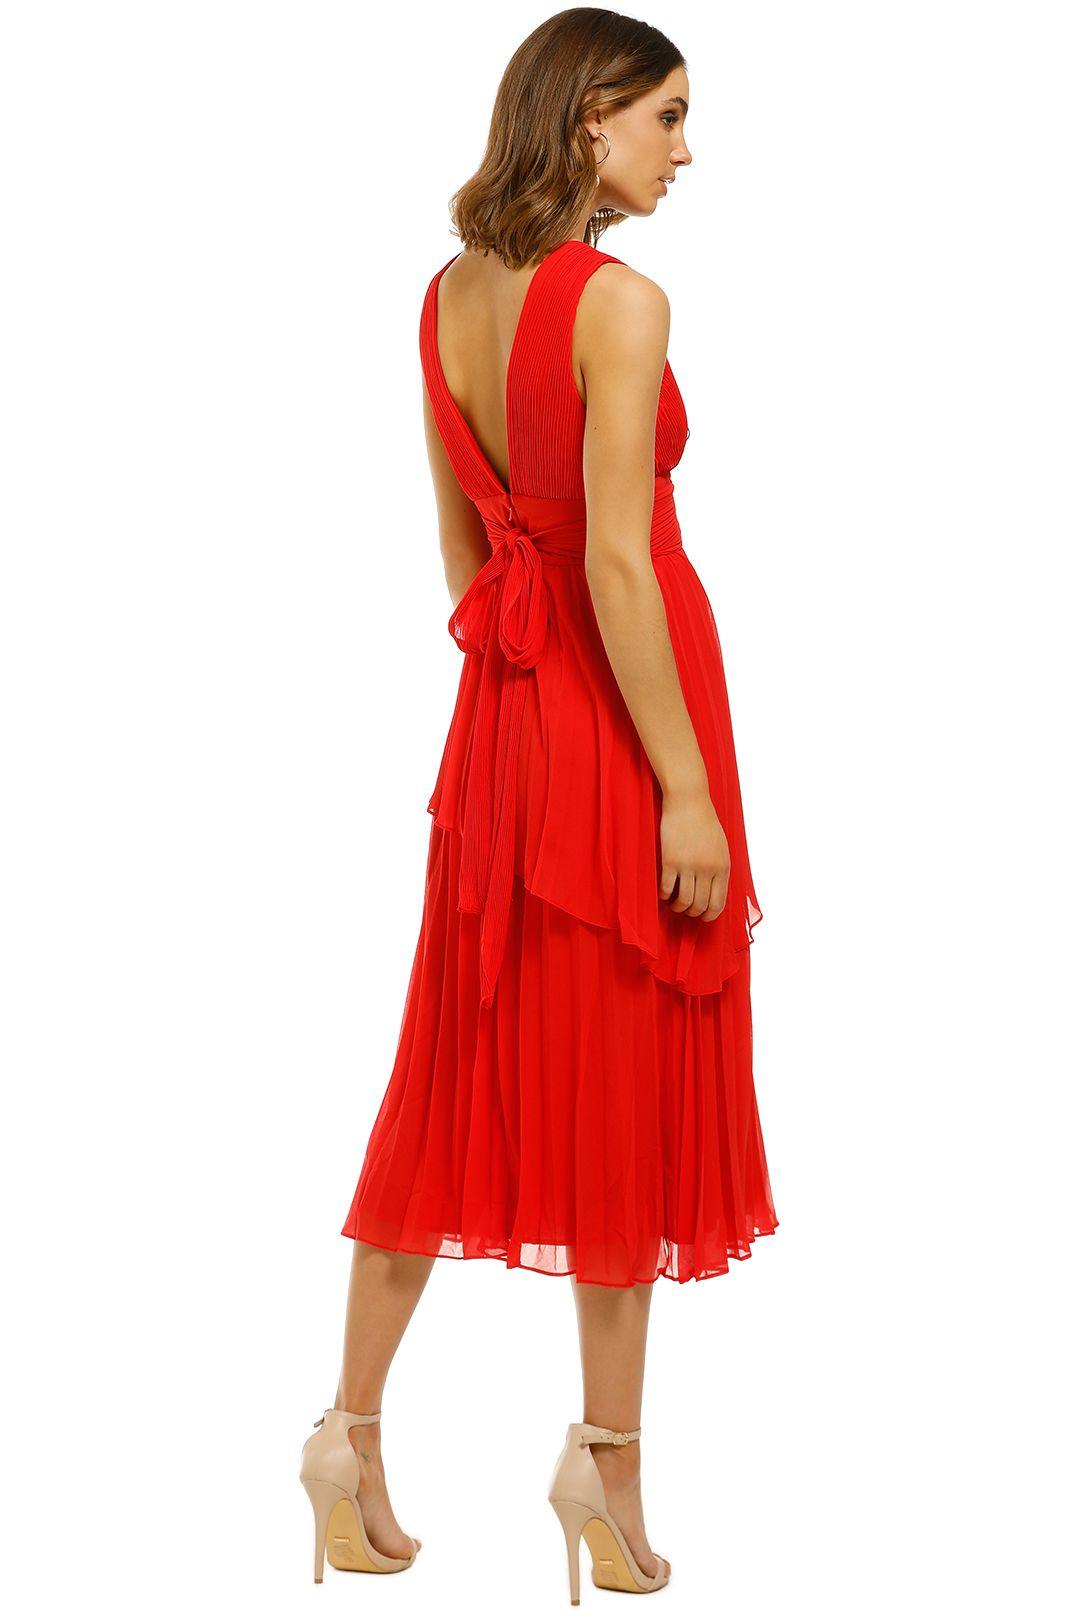 Talulah-Sugar-and-Spice-Midi-Dress-Red-Back